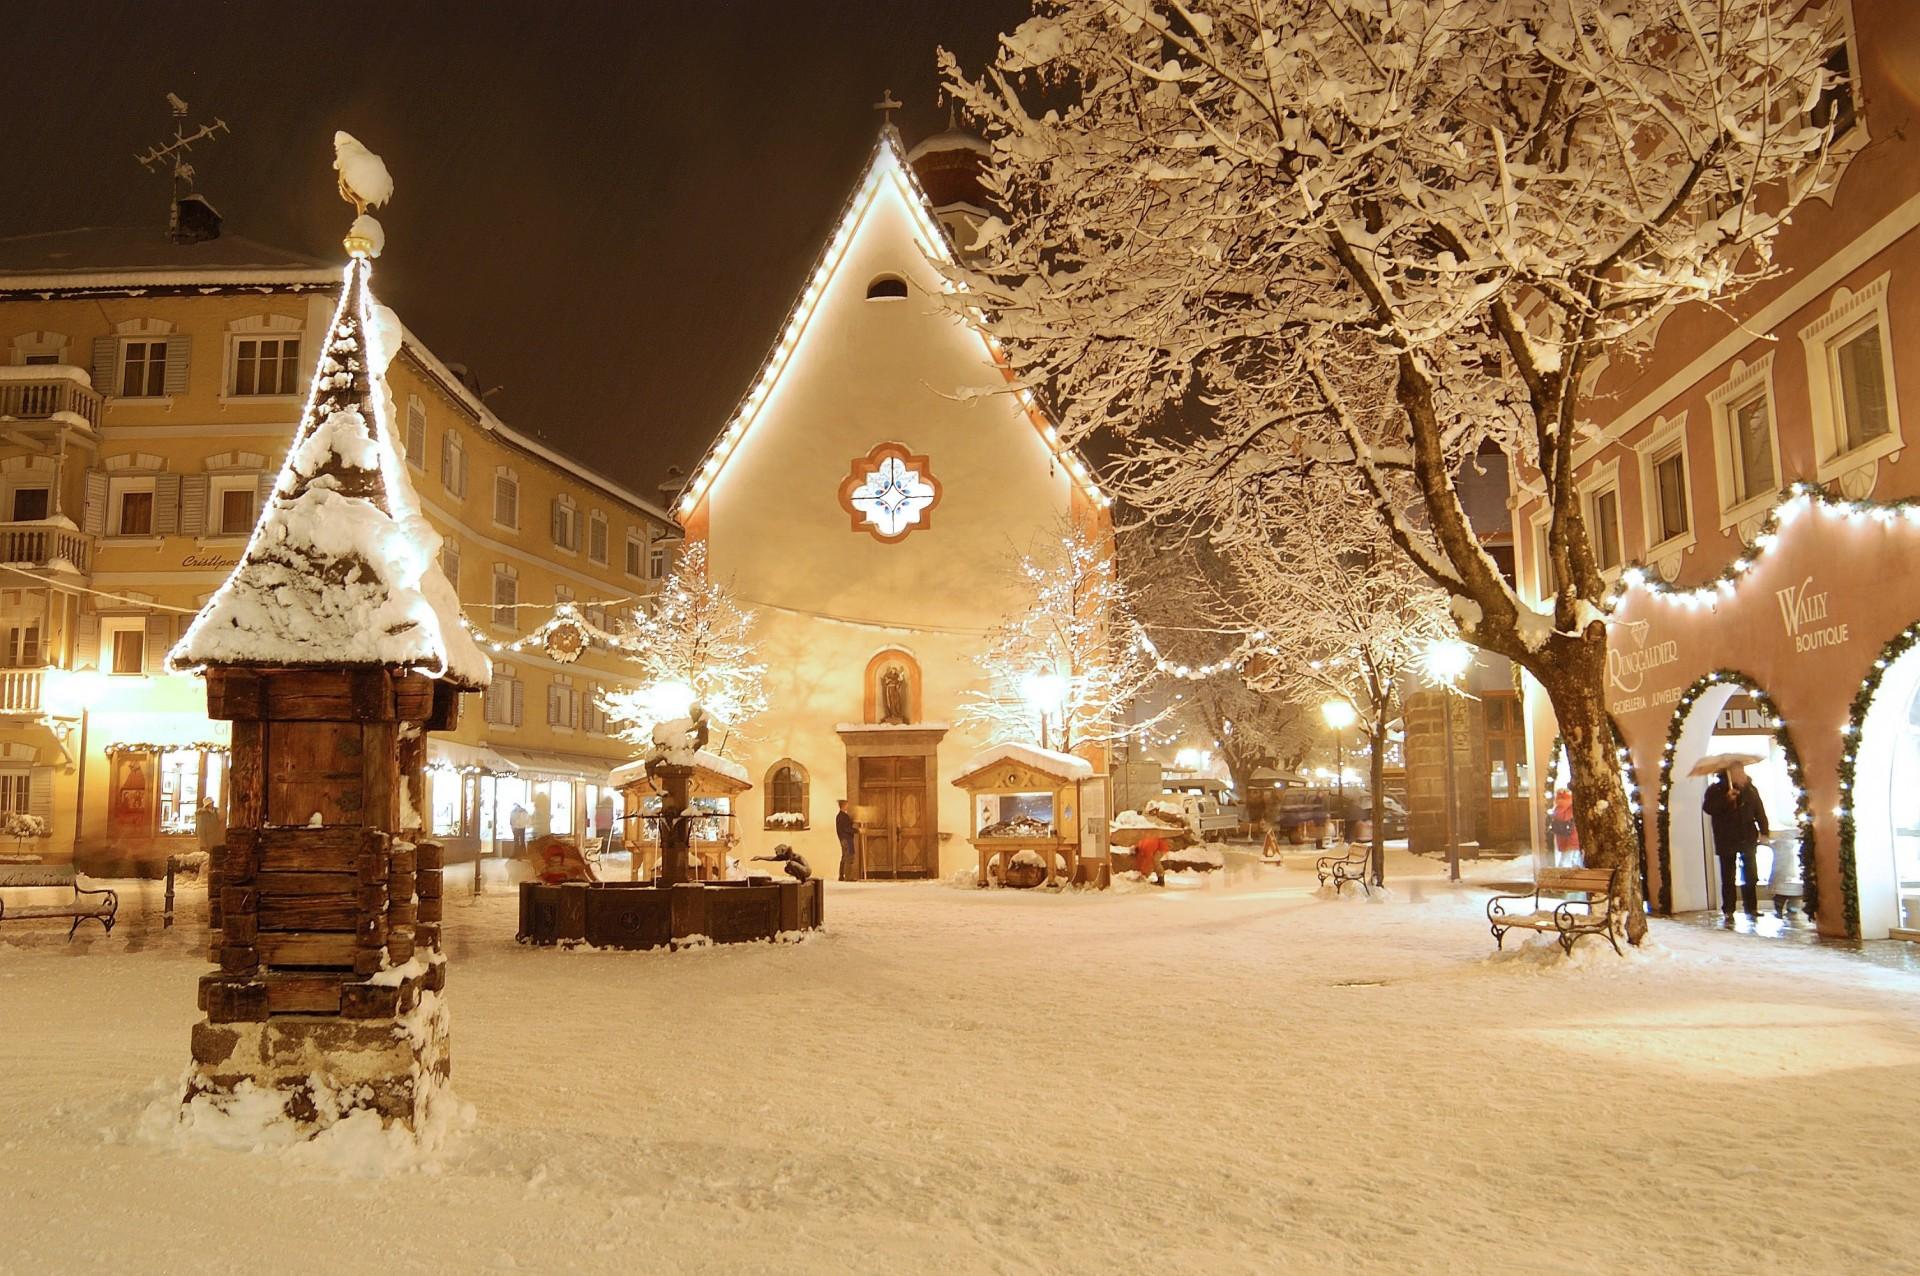 курсы обмена новый год зима картинки Коташенко